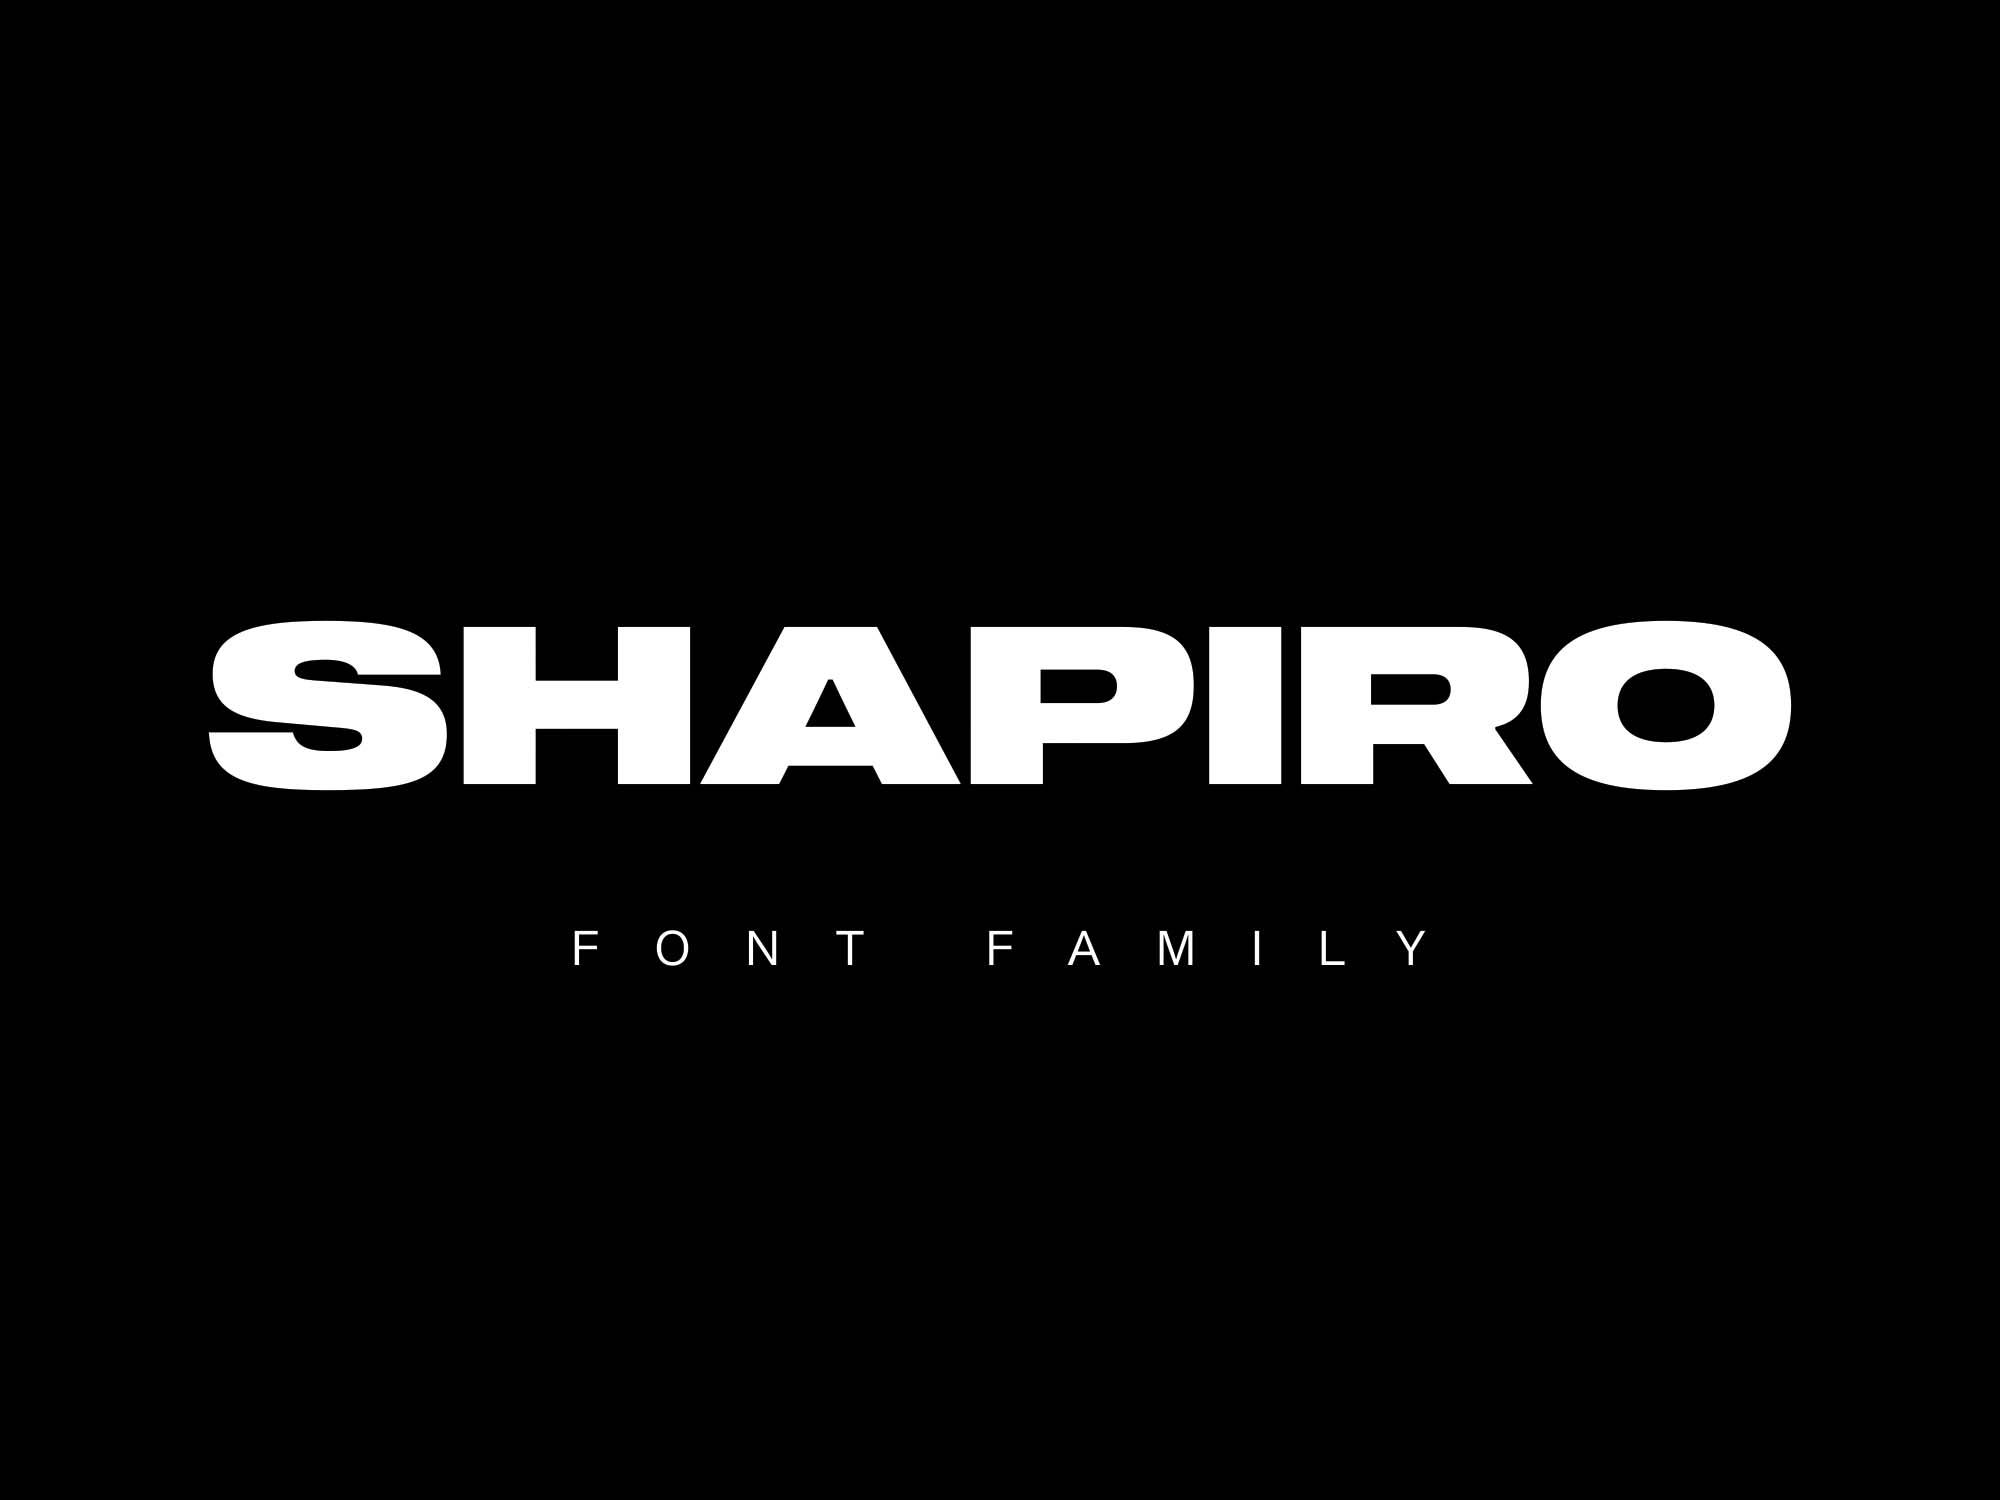 Shapiro Font